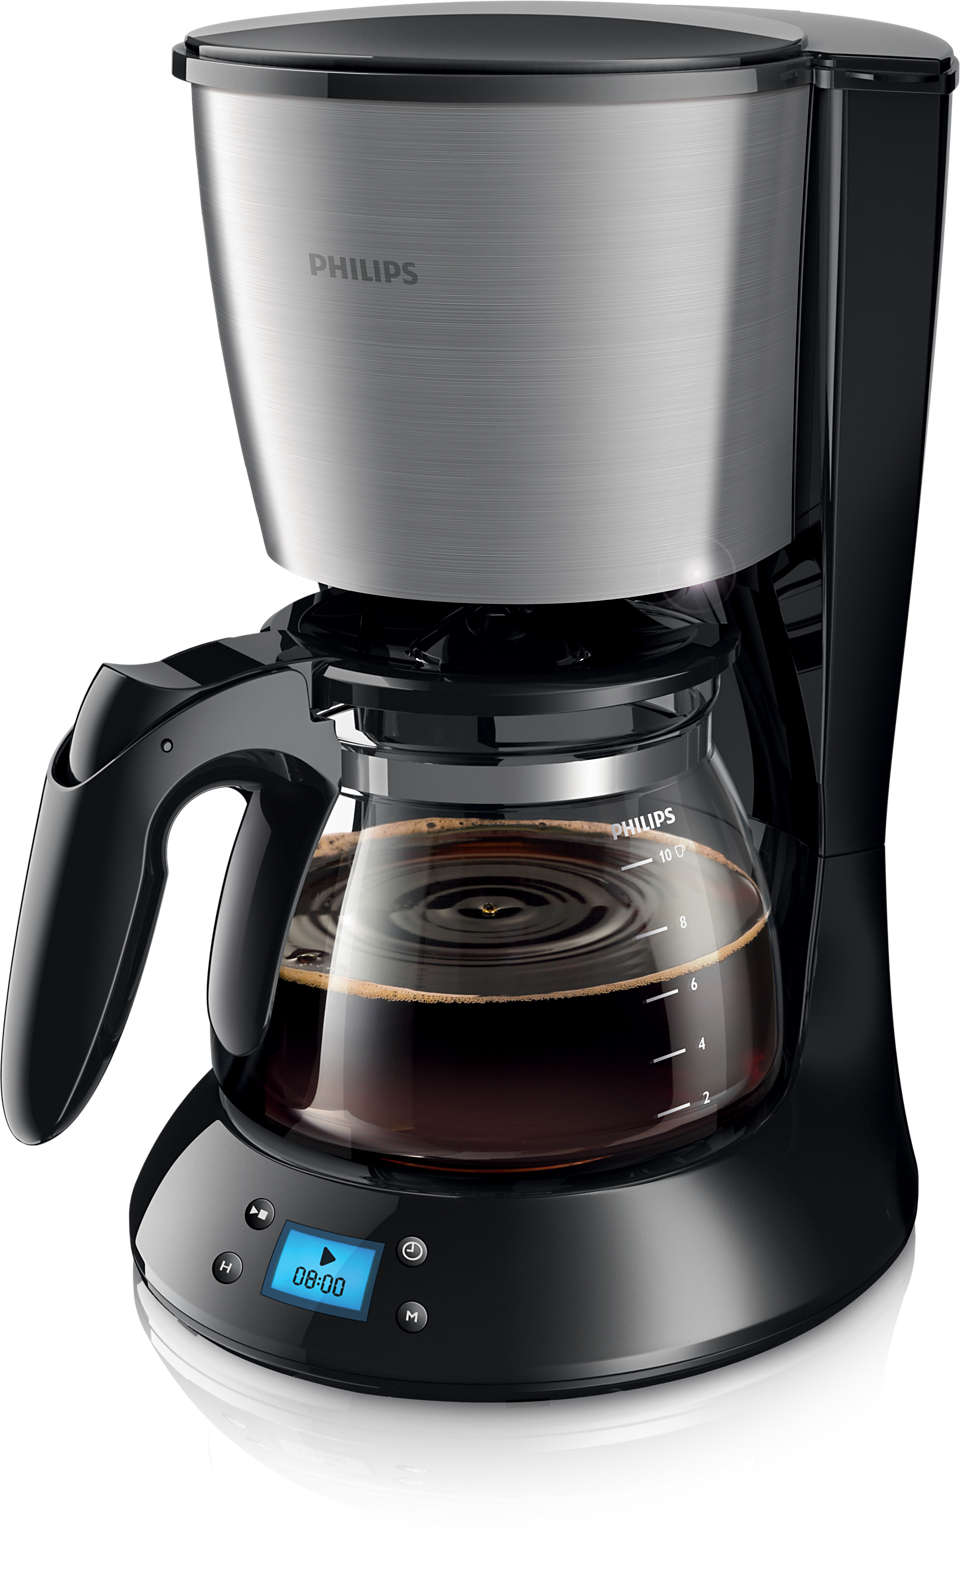 Sadece iyi kahve